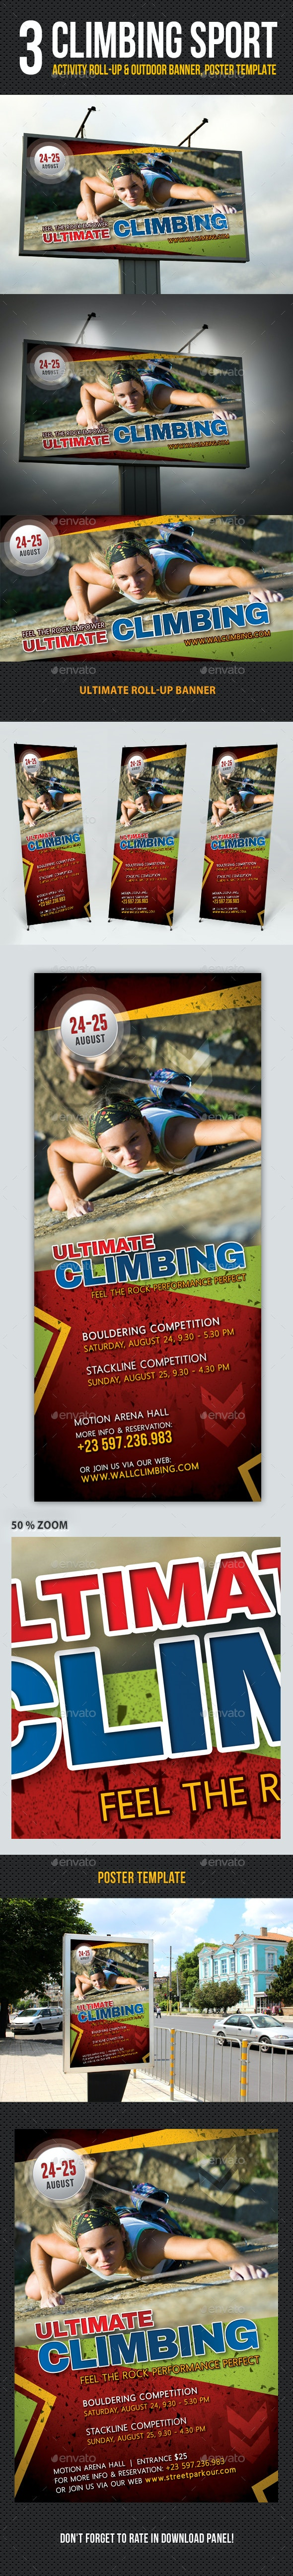 3 in 1 Climbing Sport Activity Banner Bundle